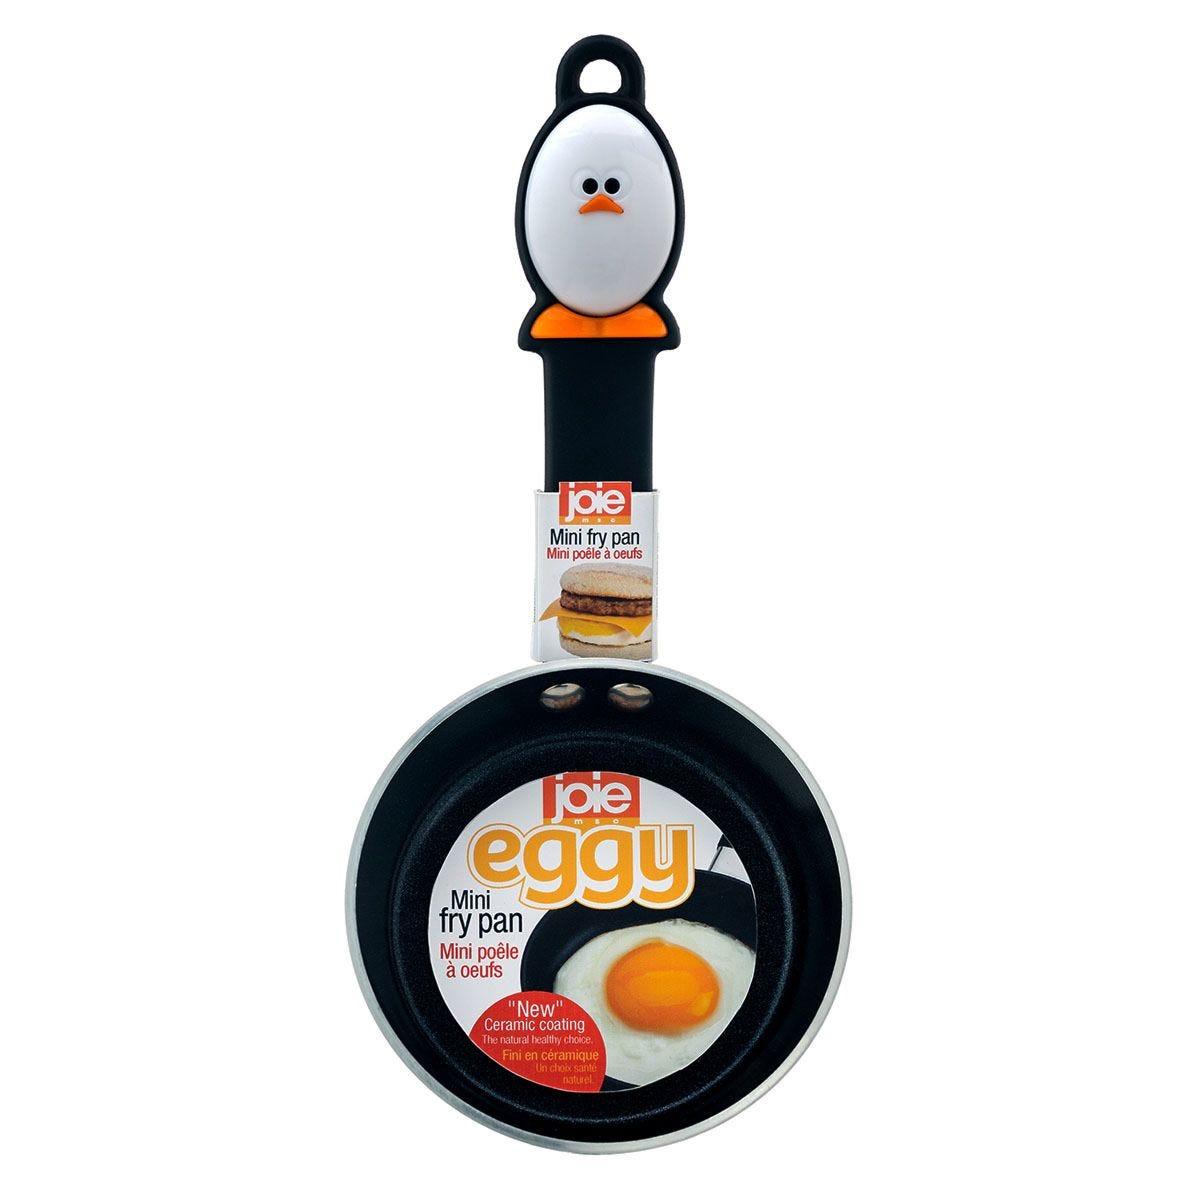 Joie Mini Egg Fry Pan